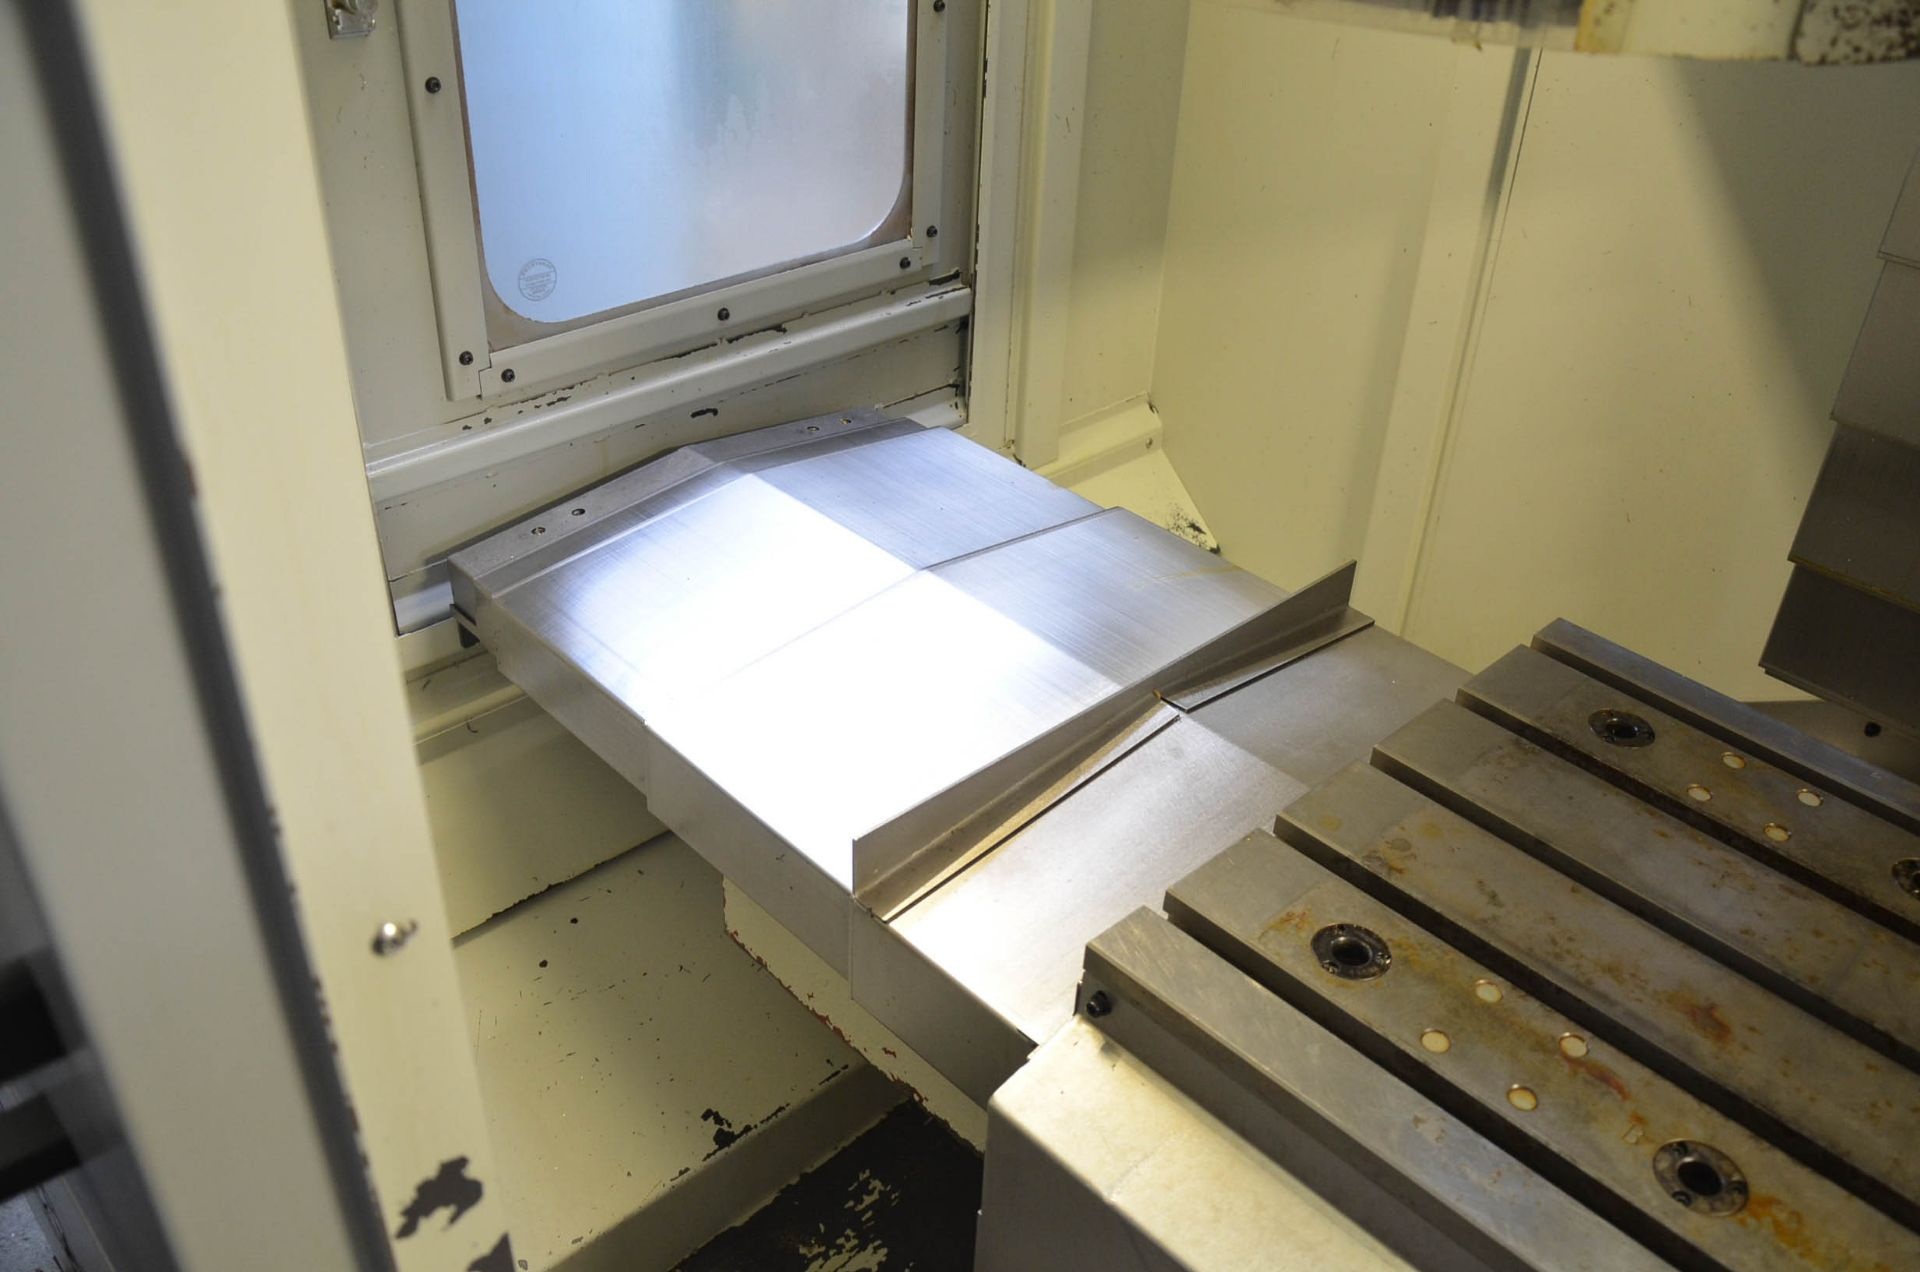 SWI (2014) TRAK LPM 4-AXIS READY CNC VERTICAL MACHINING CENTER WITH PROTO TRAK PMX CNC CONTROL, 19. - Image 9 of 12